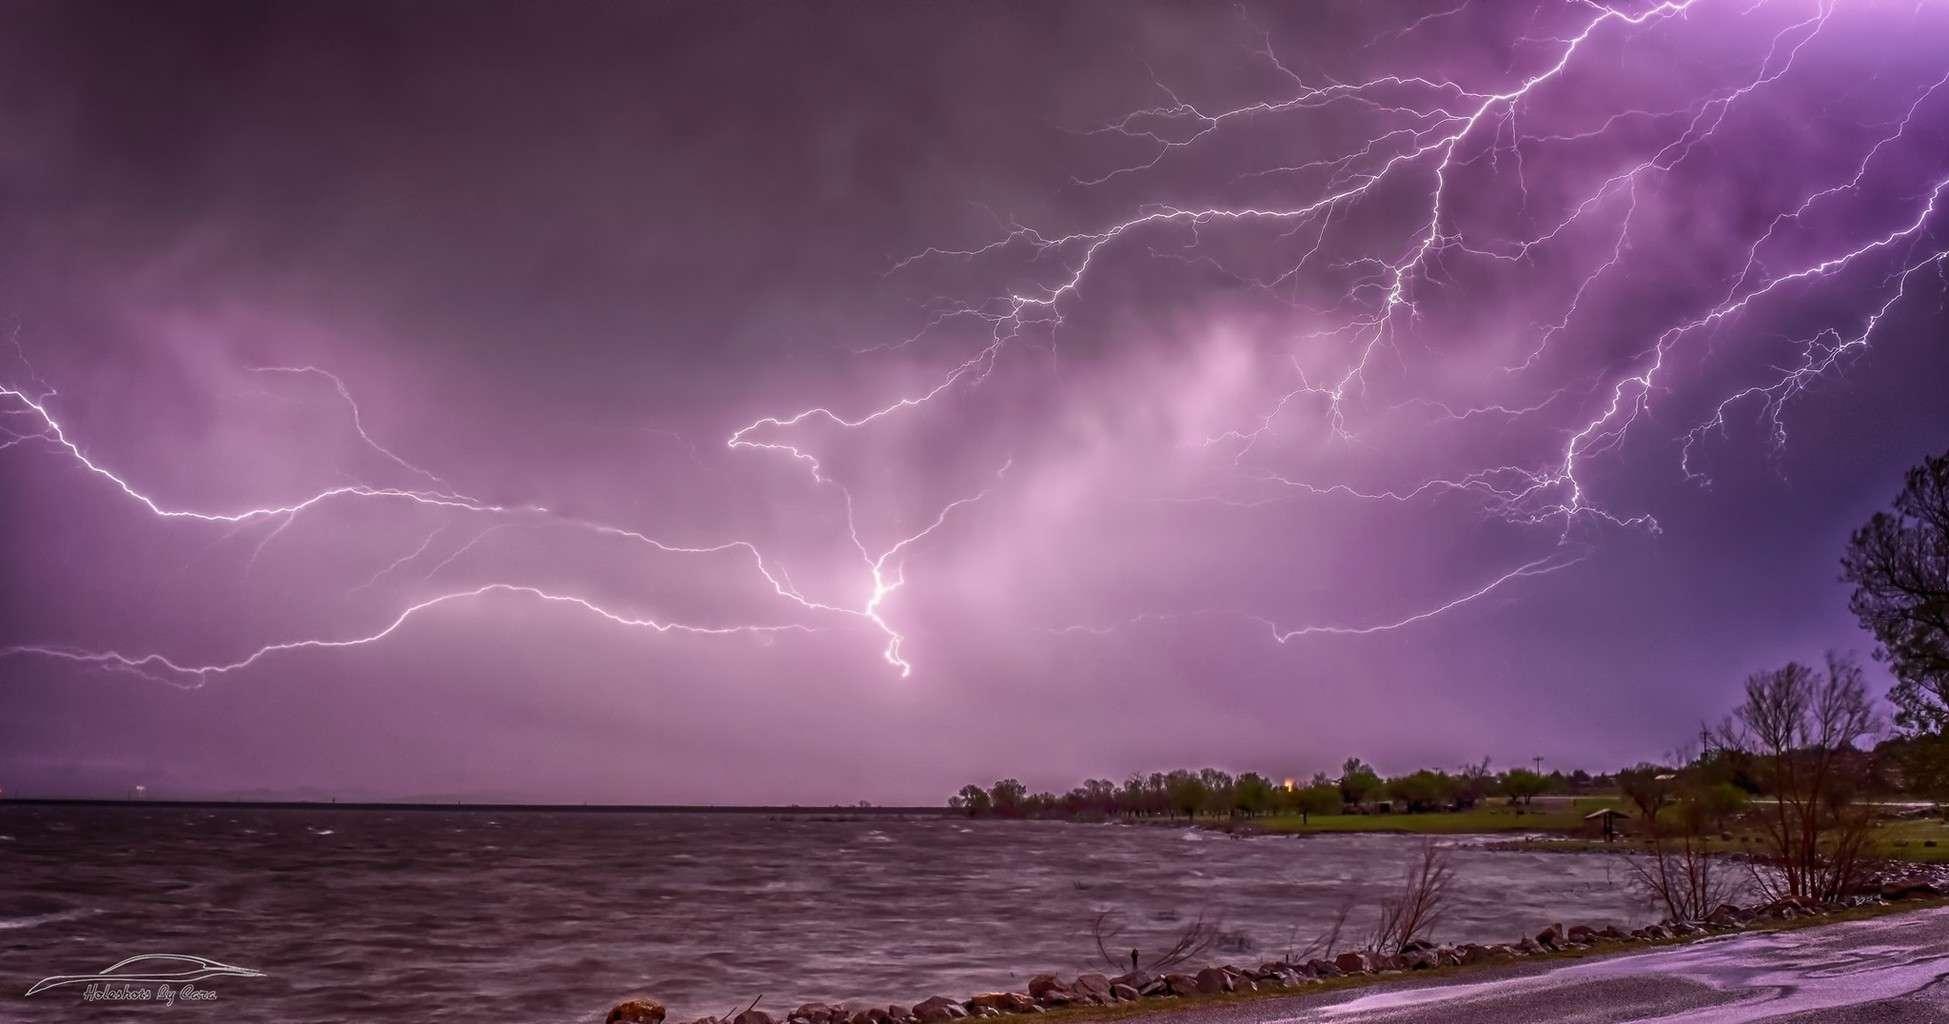 Tom SteedCaptured this lightning over Lake - Snyder, OK 3/28/17